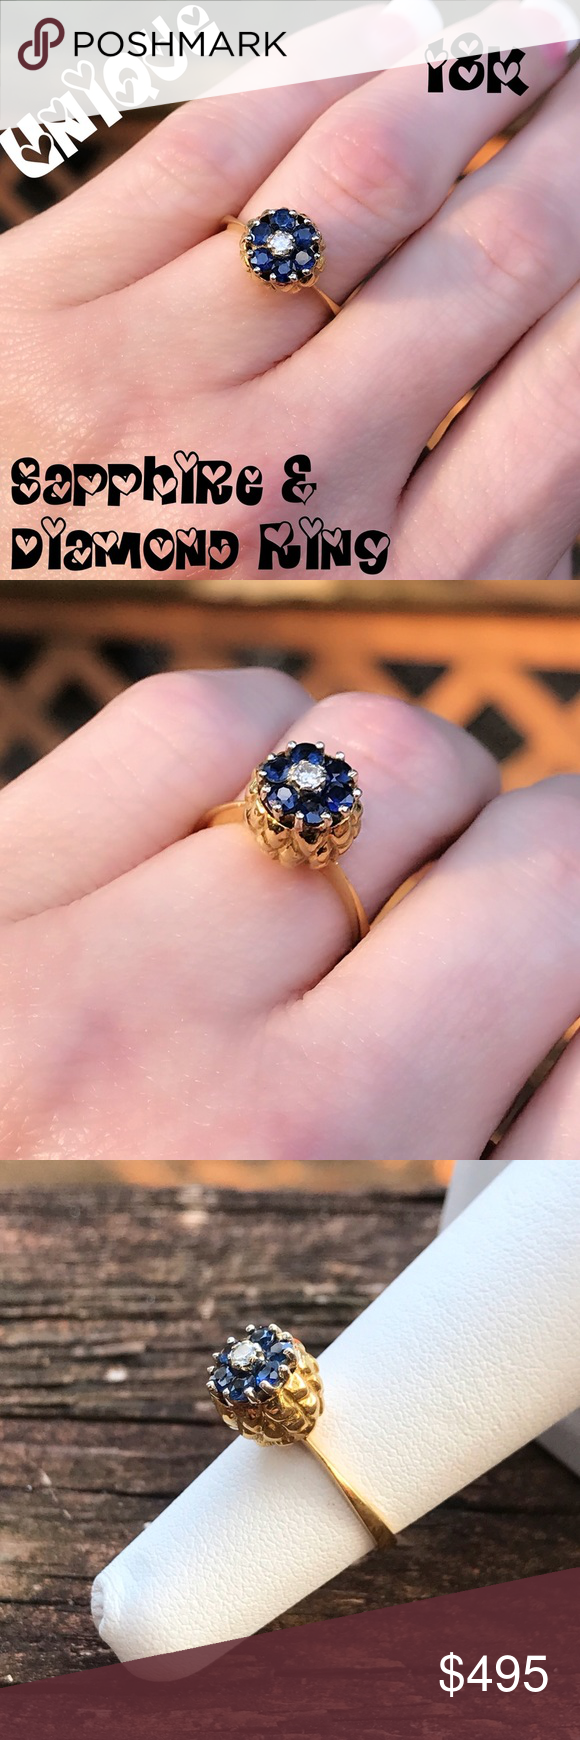 💘18K Solid Amazing Sapphire & Diamond Ring Heavy | Pineapple design ...